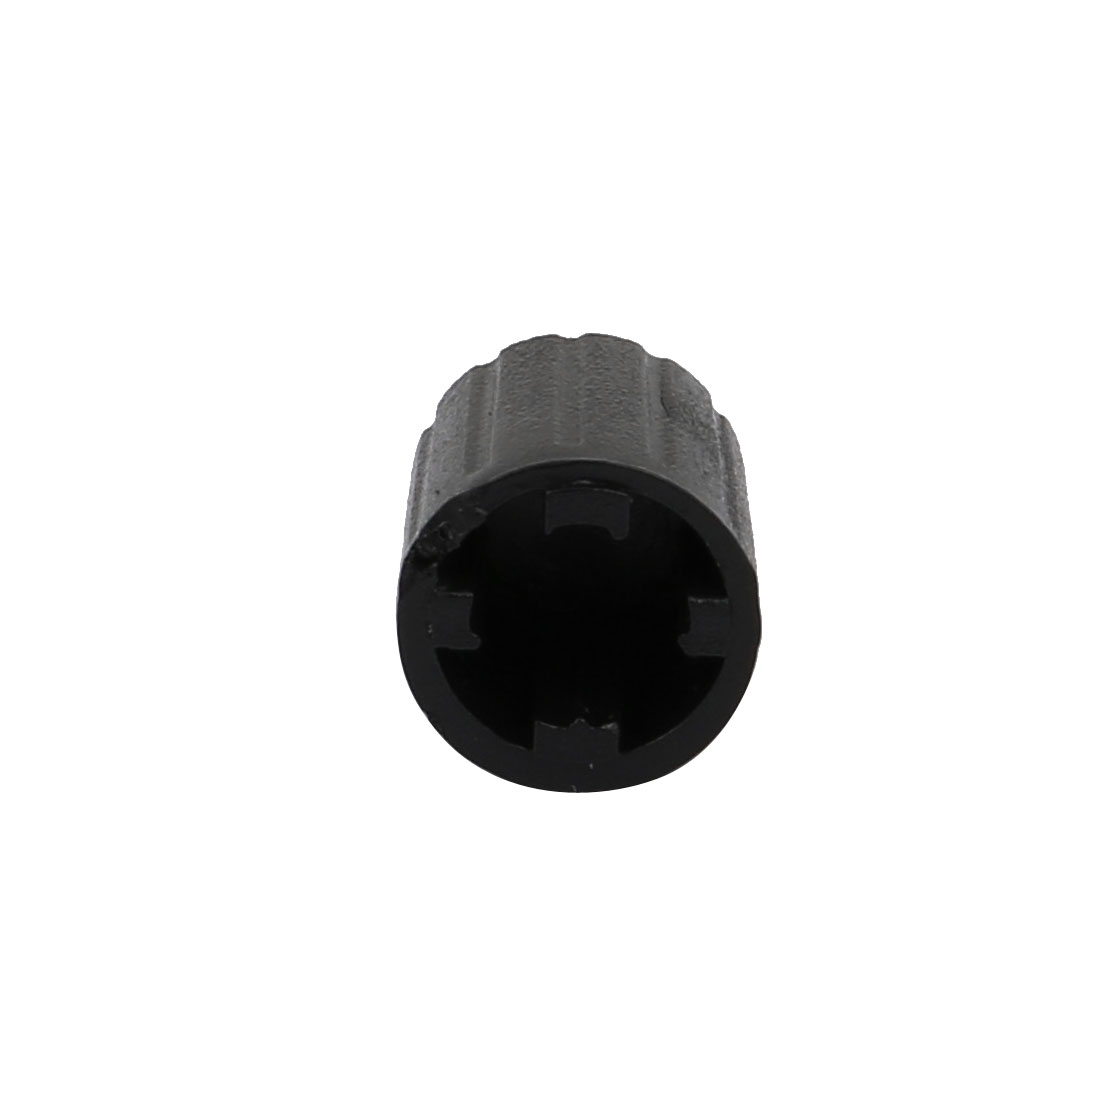 20 Pcs 9.8mm x 12mm Plastic Potentiometer Volume Control Rotary Knob Cap Red